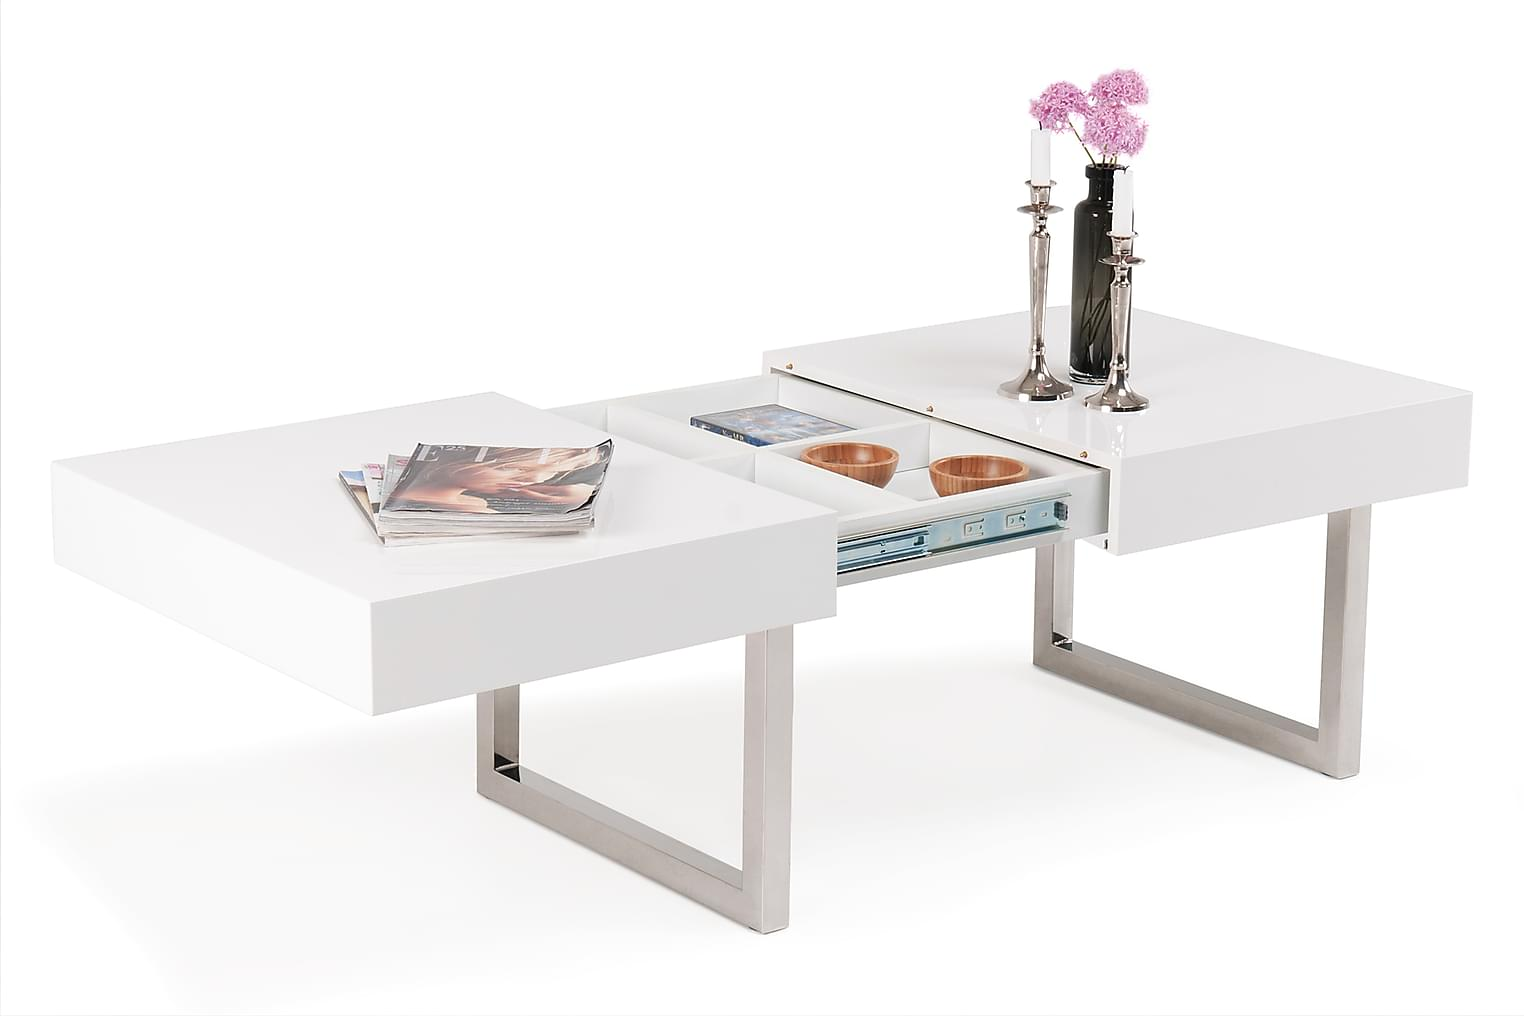 Scandinavian Choice Line Salongbord - Hvit H?yglans